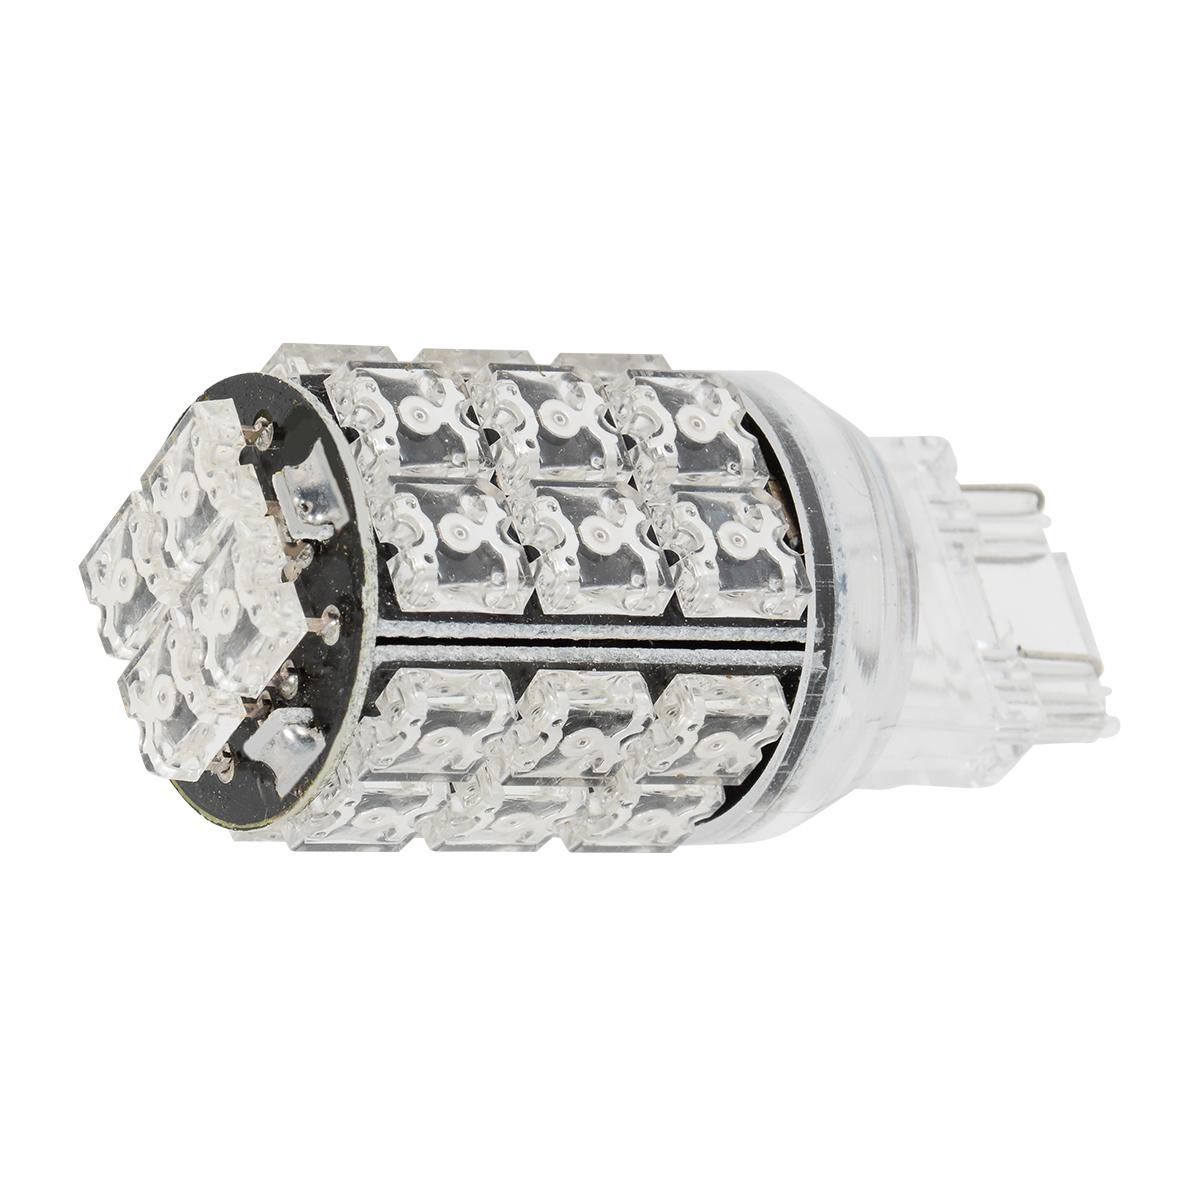 3156 Tower Style 28 LED Light Bulb